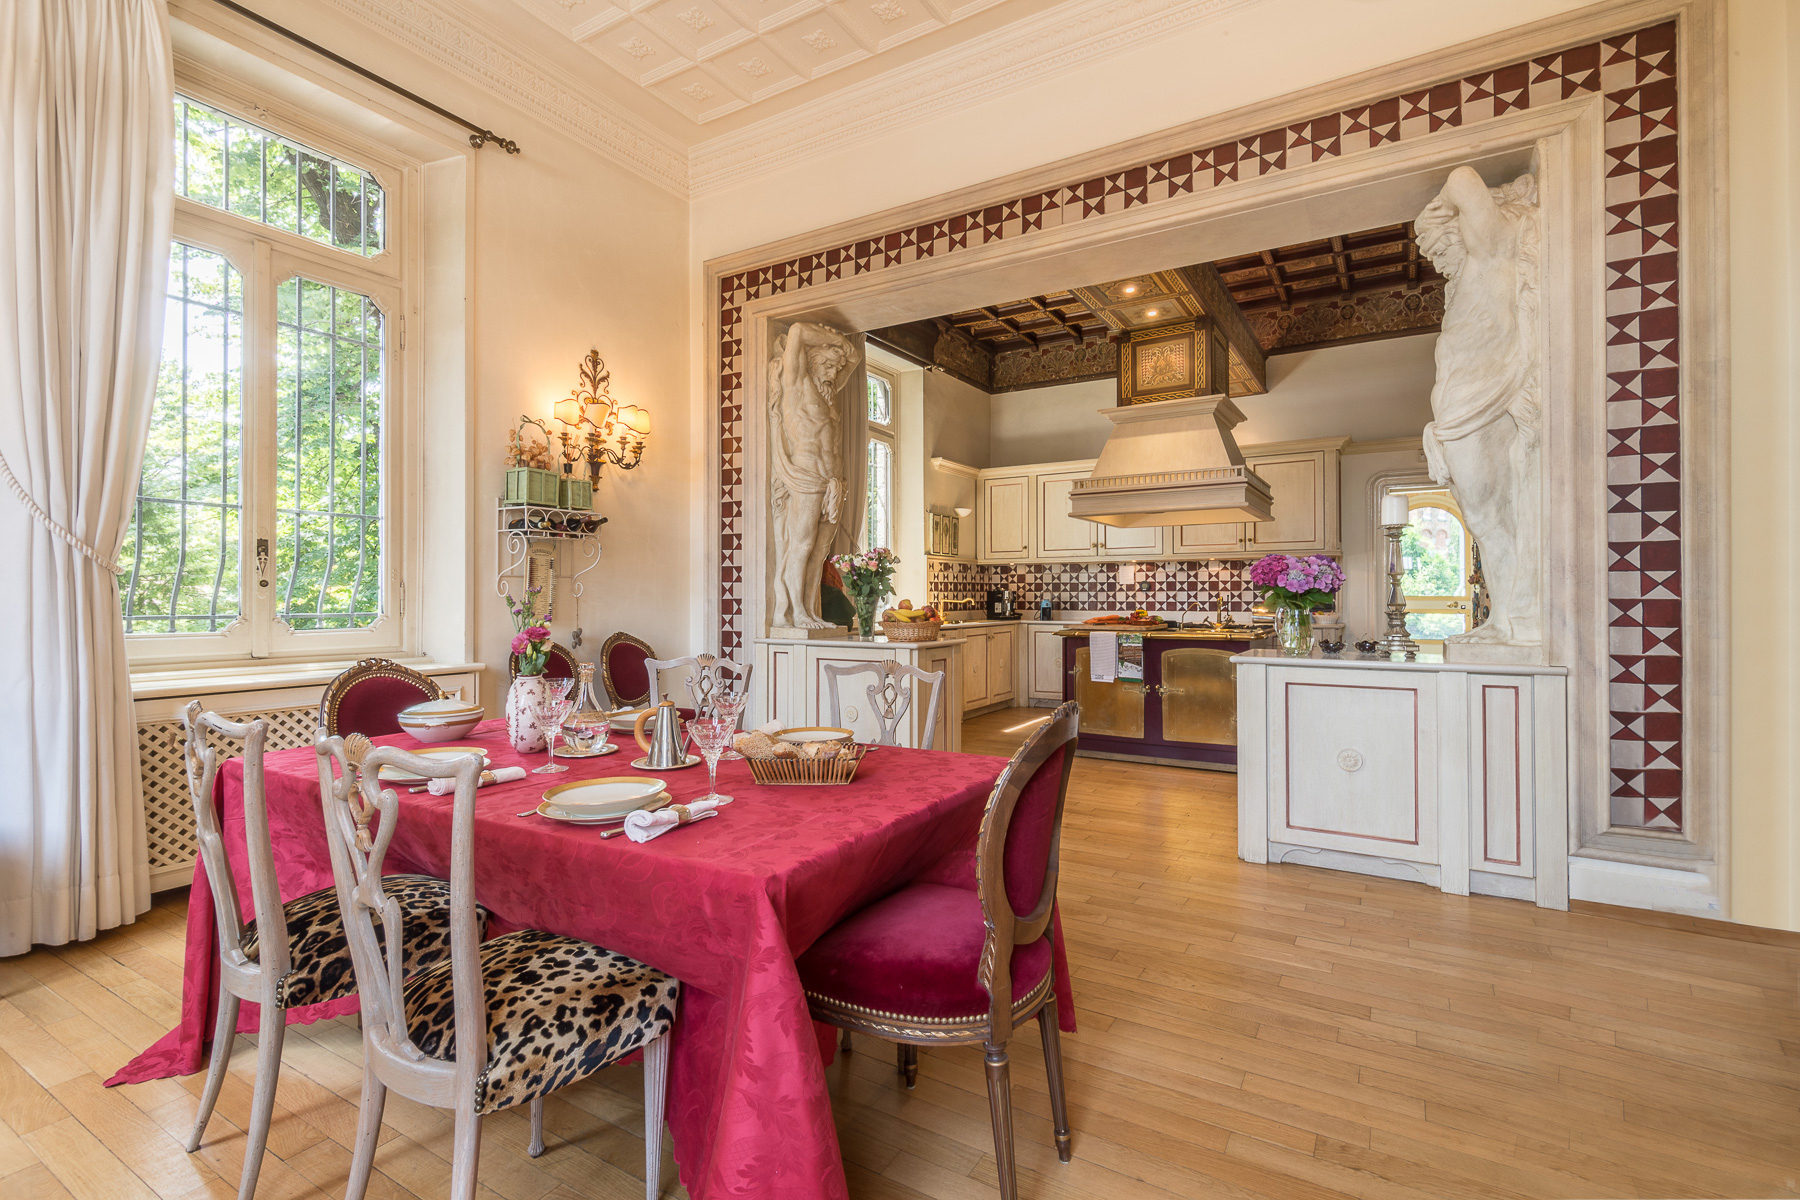 Villa in Vendita a Varese: 5 locali, 1150 mq - Foto 5